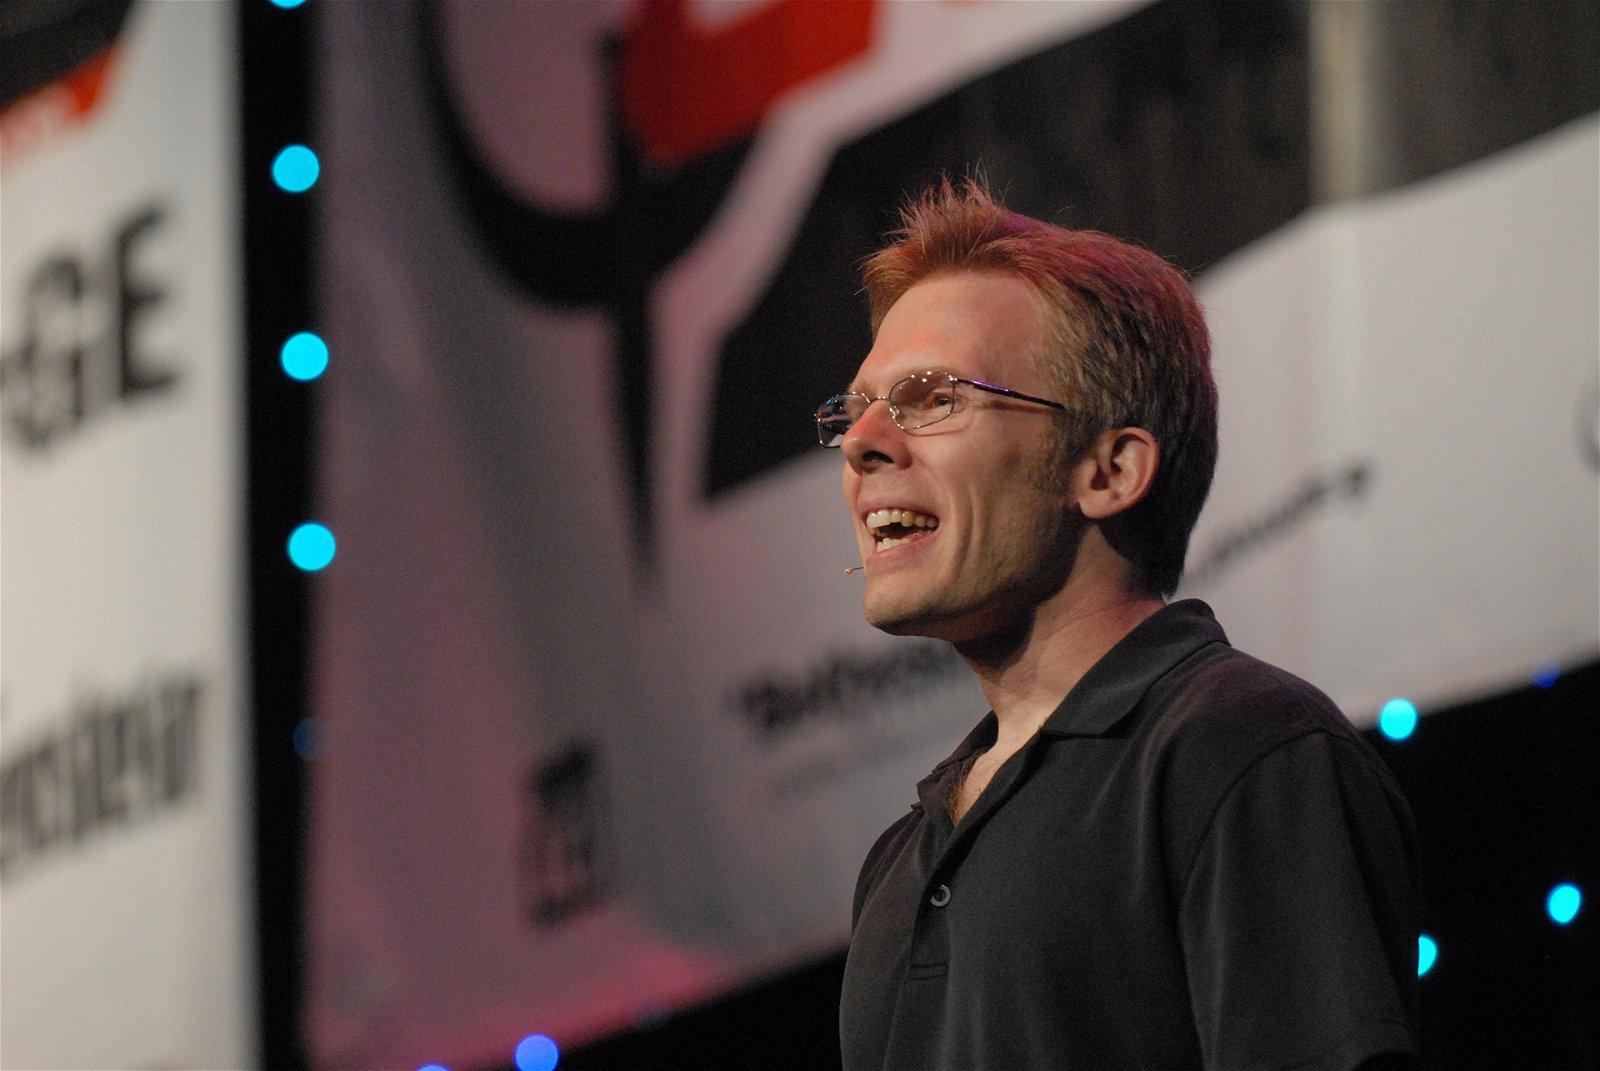 Zenimax Names Carmack In Oculus Lawsuit